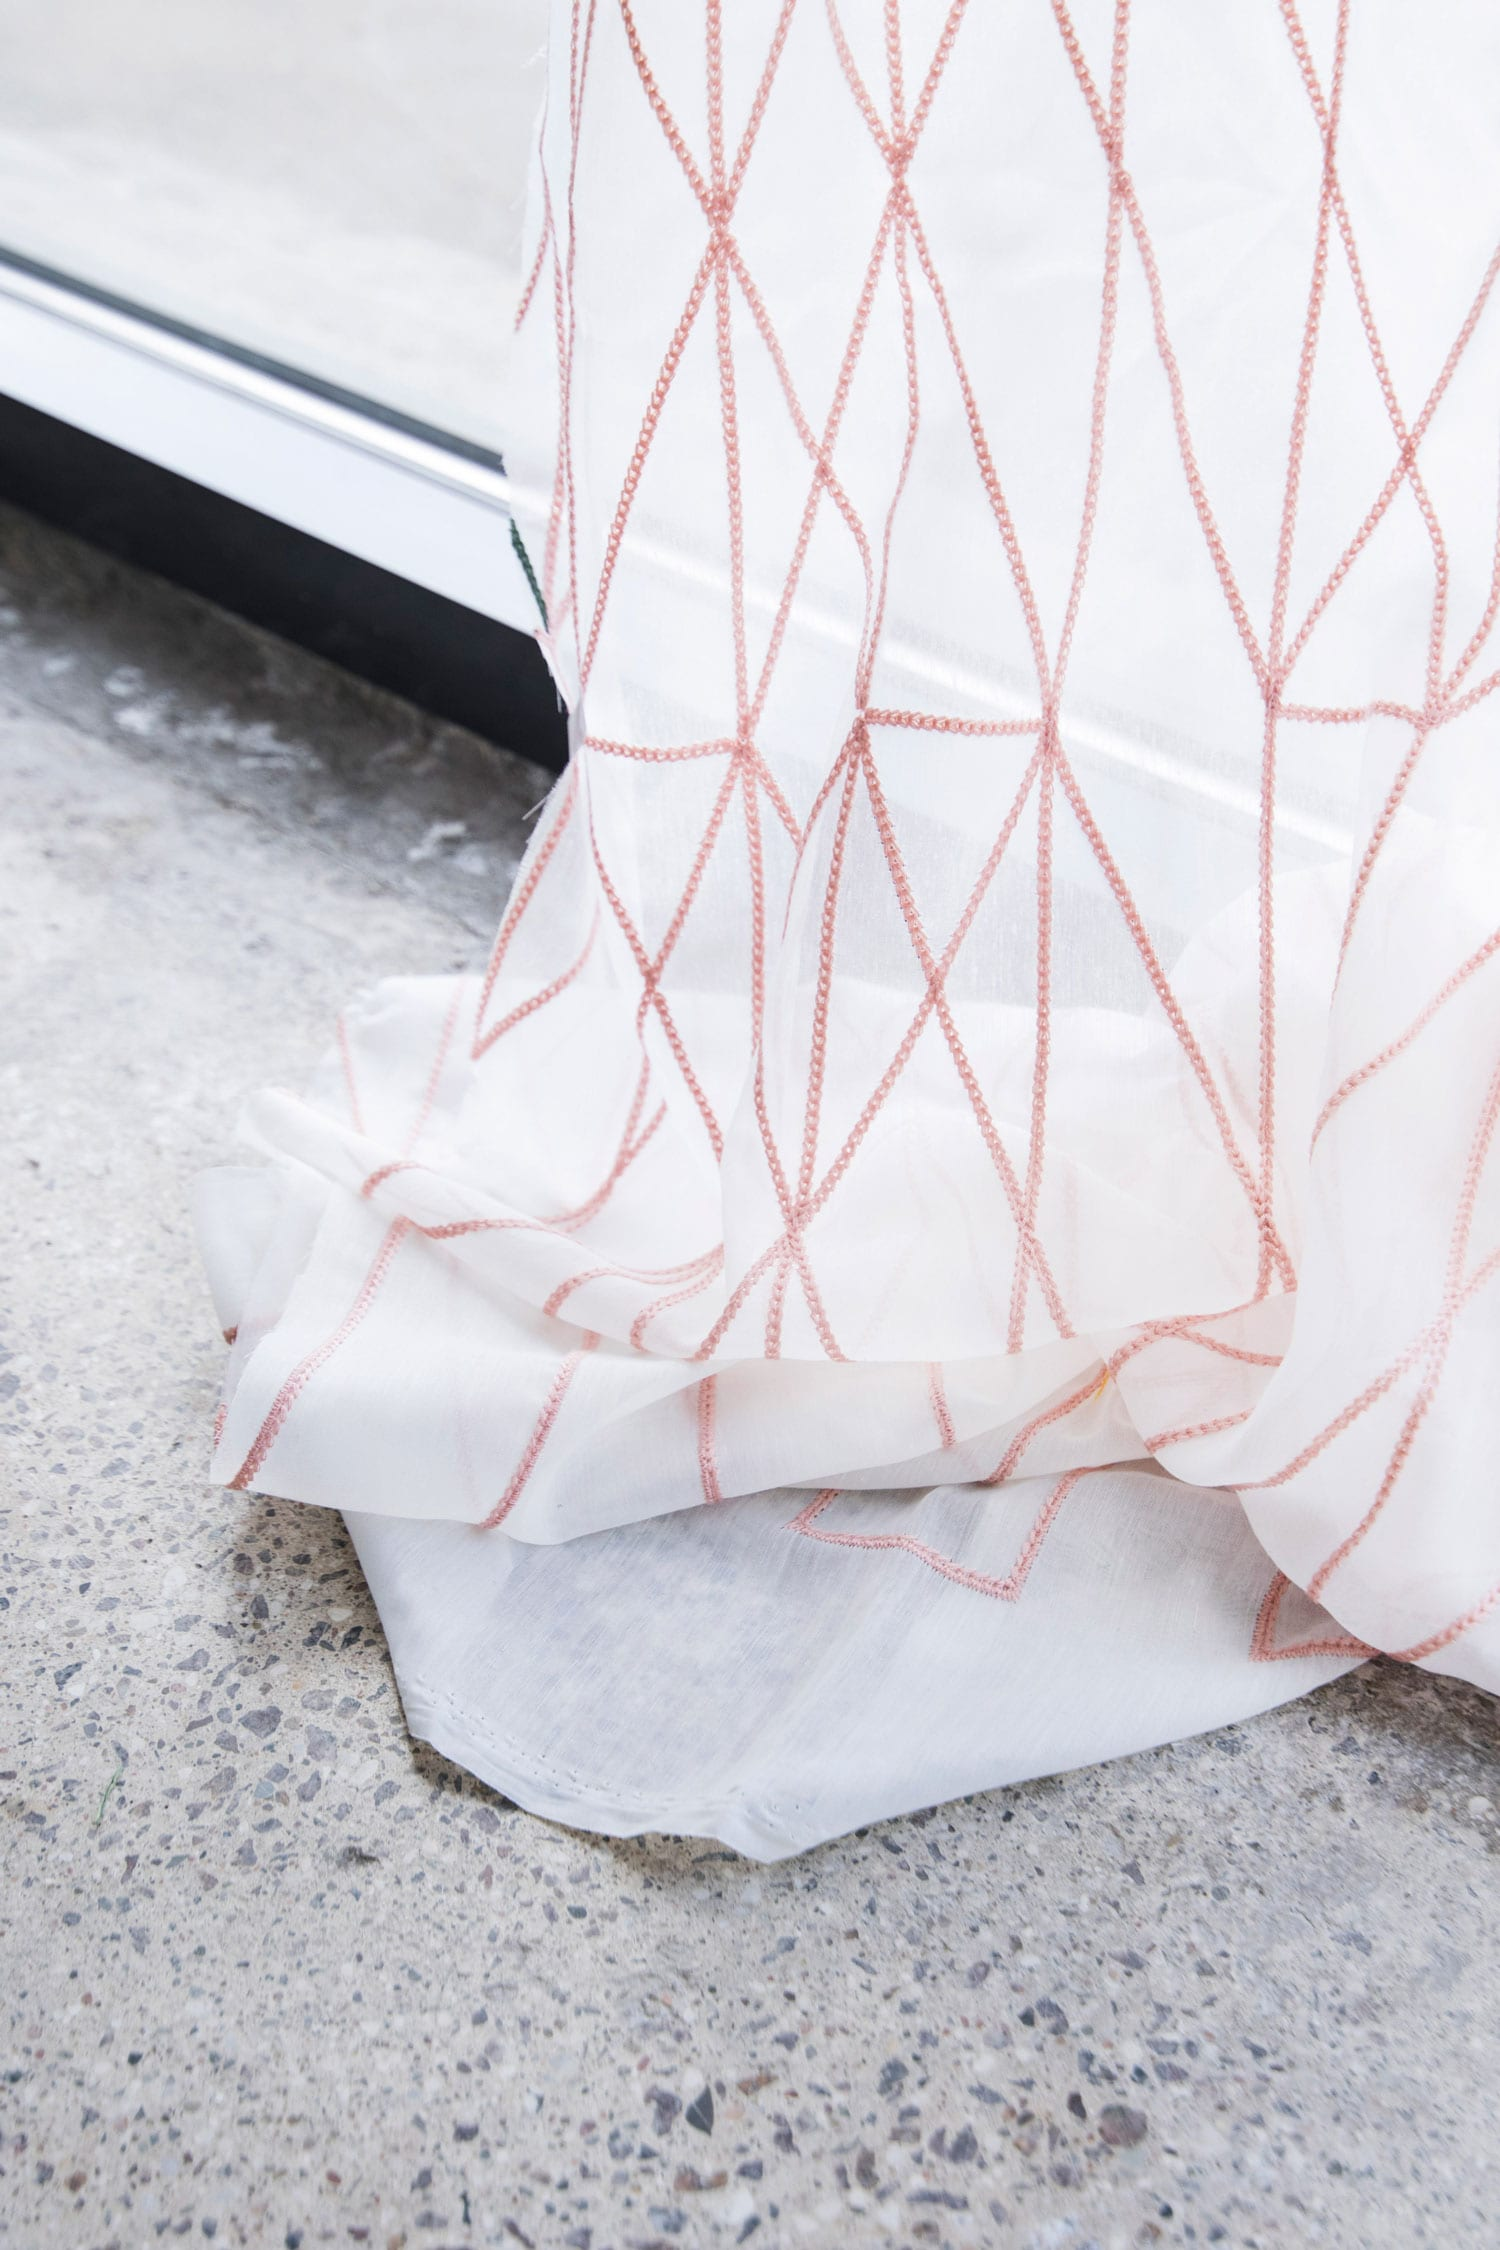 Ronan & Erwan Bouroullec Embroider Geometric Patterns on Translucent Kvadrat Fabric Stockholm Furniture Fair 2018   Yellowtrace